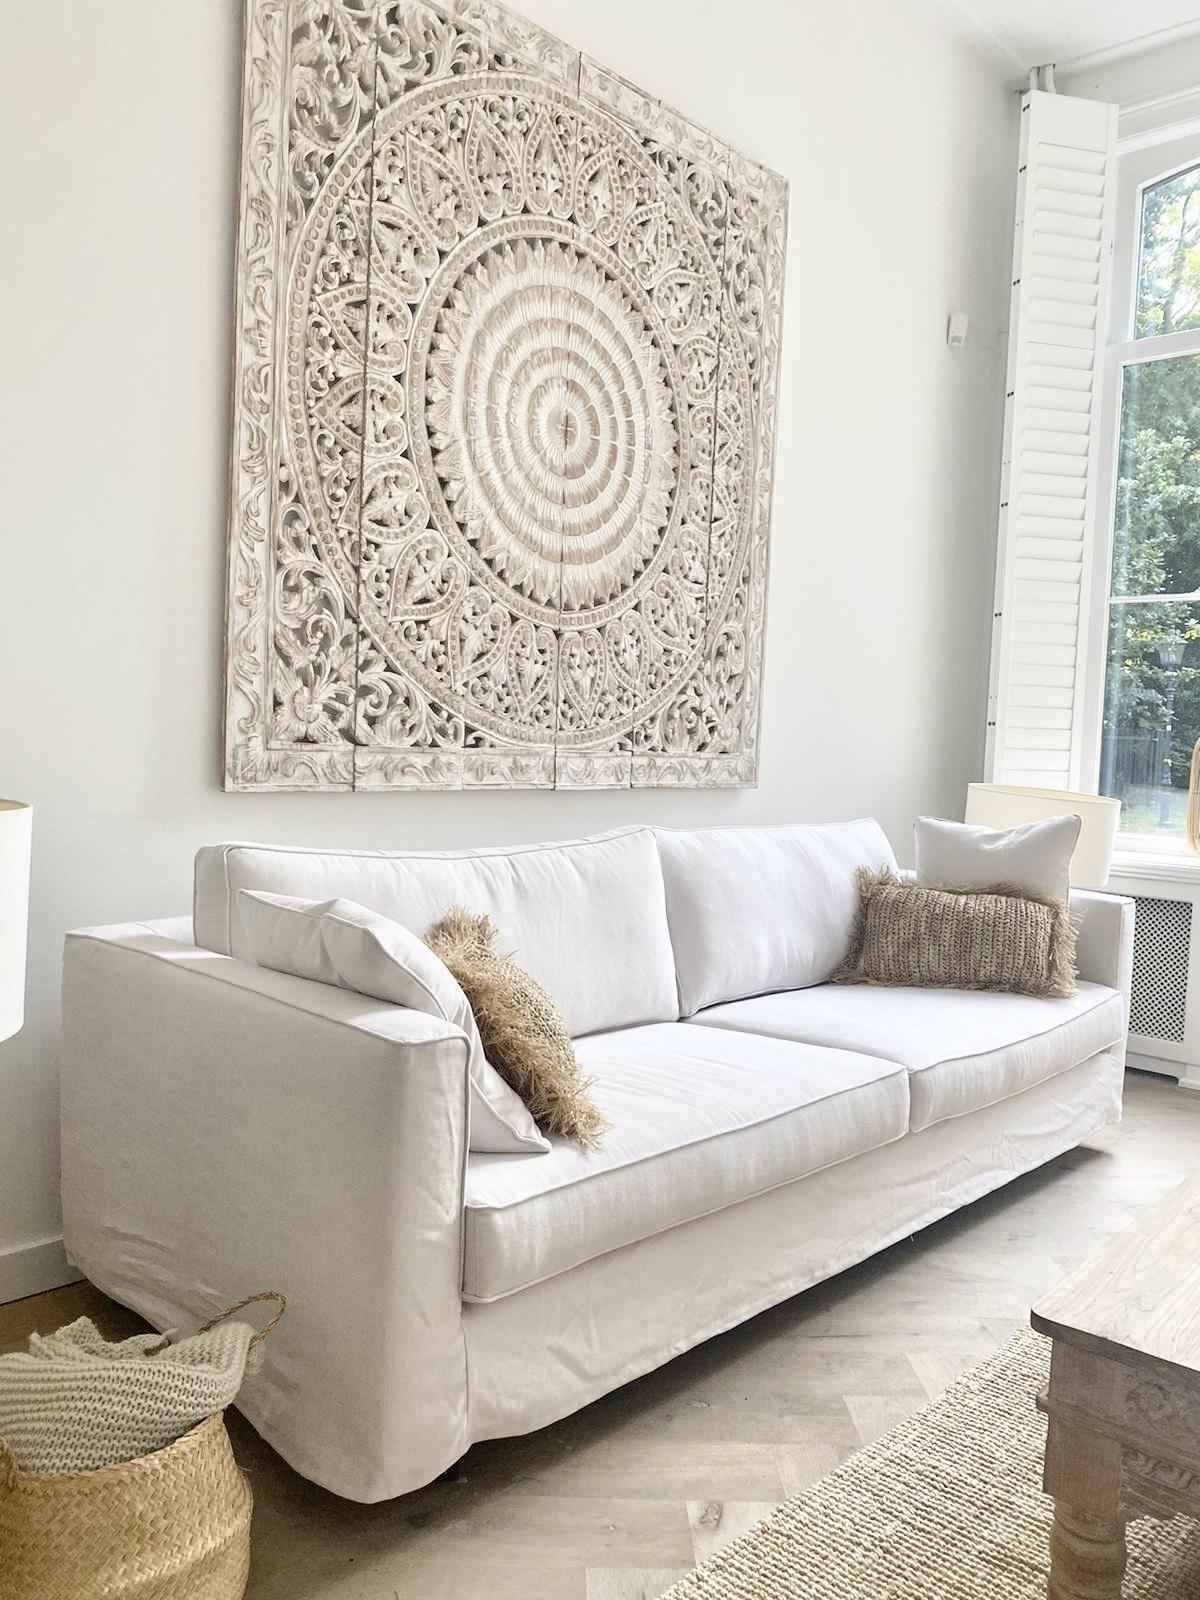 Simply Pure Handgefertigte Simply Pure signature Sofa PURE in 360 Farben ( mit abnehmbarem waschbaren Bezug)